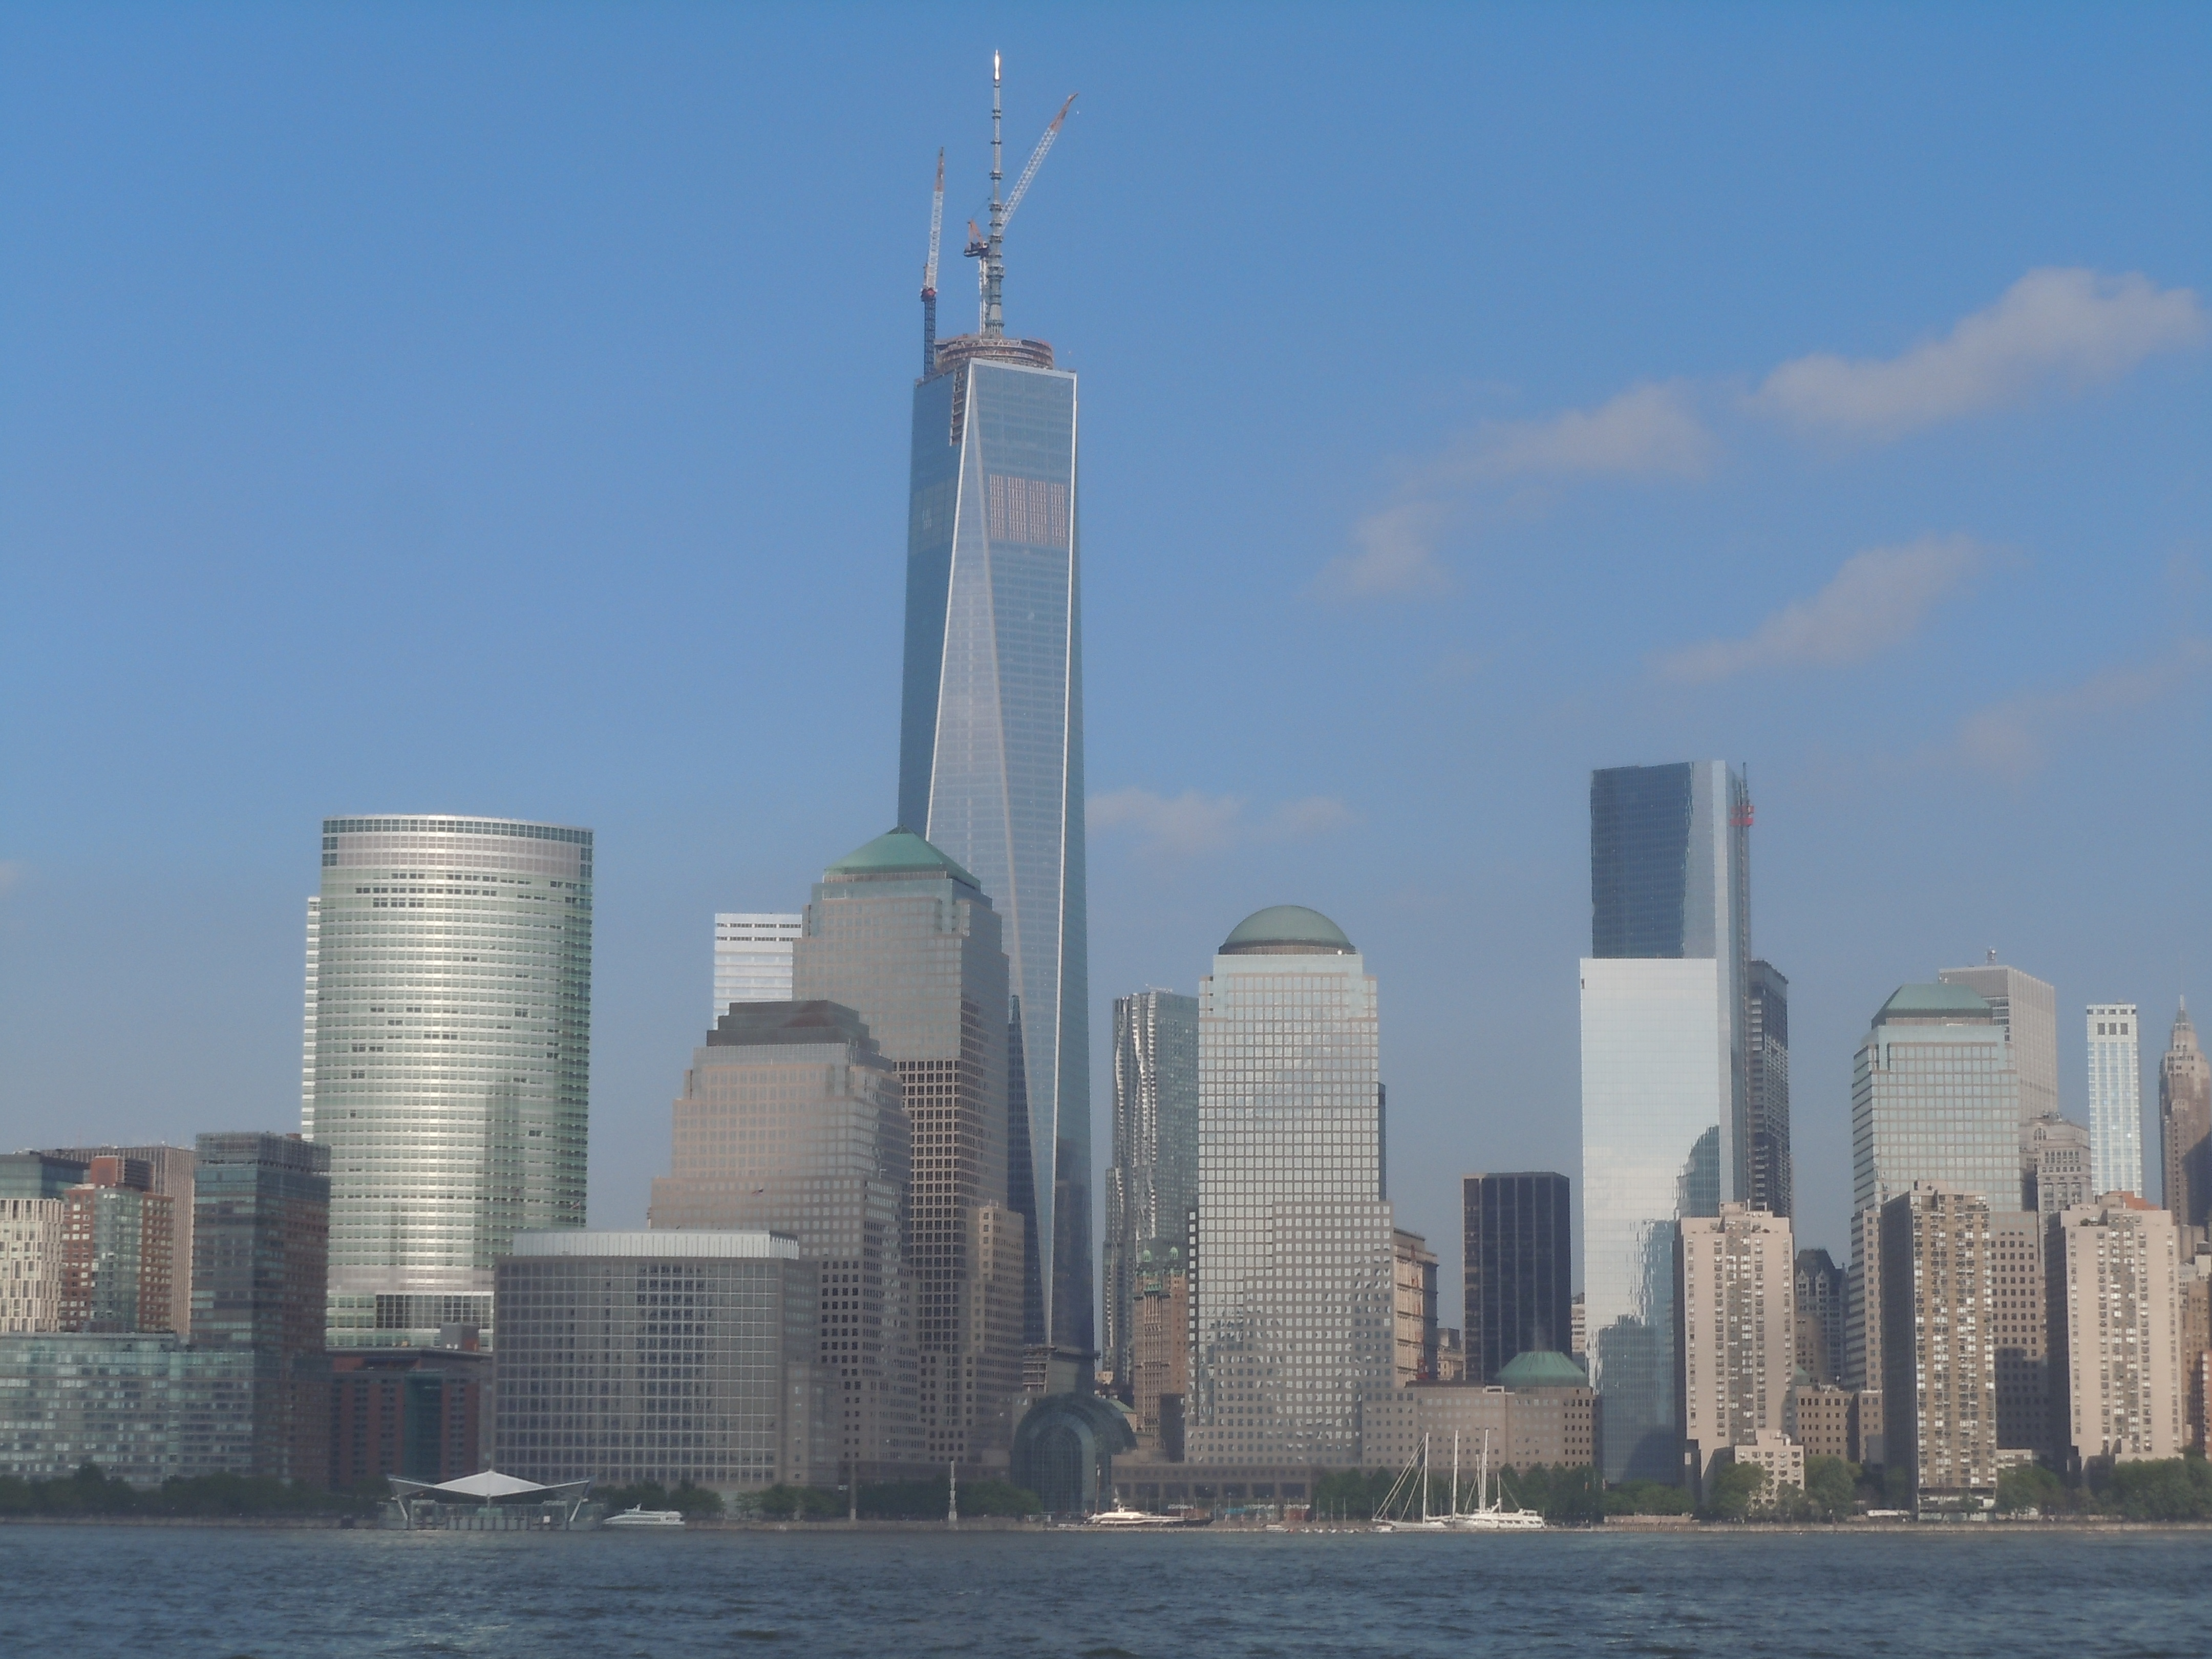 Tower 7 World Trade Center File:world Trade Center 1 7